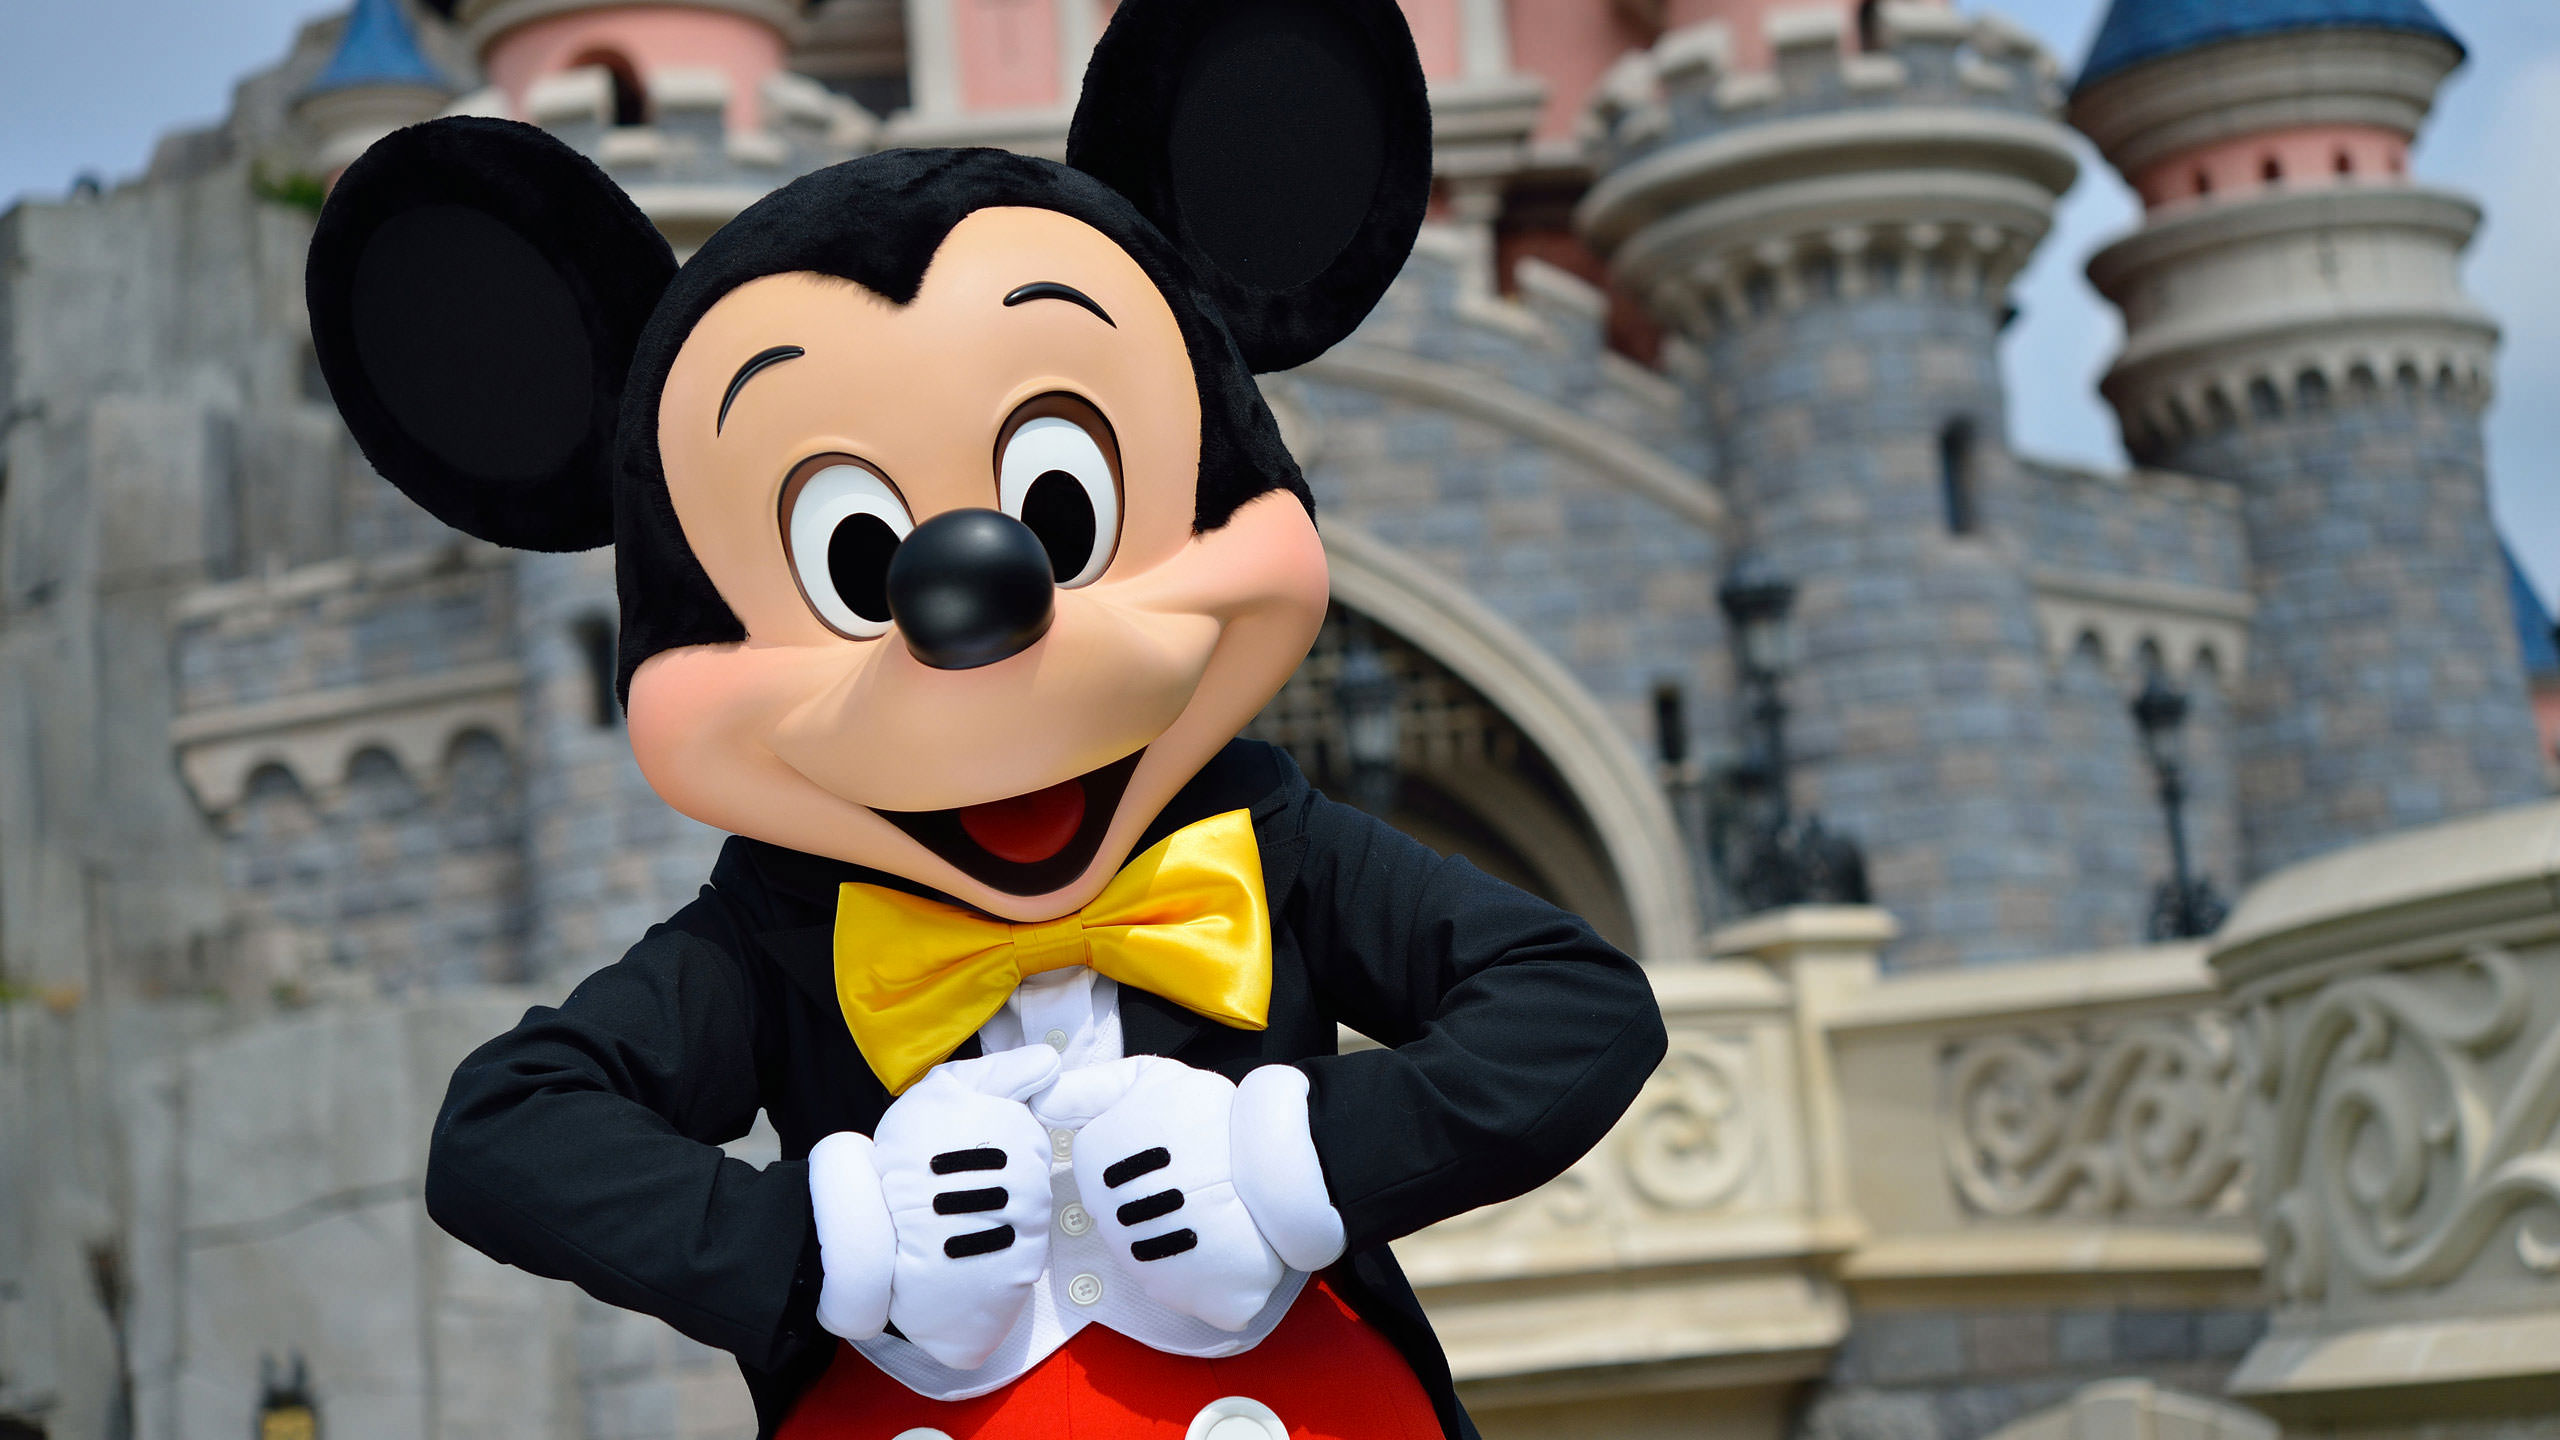 Joyeux Anniversaire Mickey A Disneyland Paris Hello Disneyland